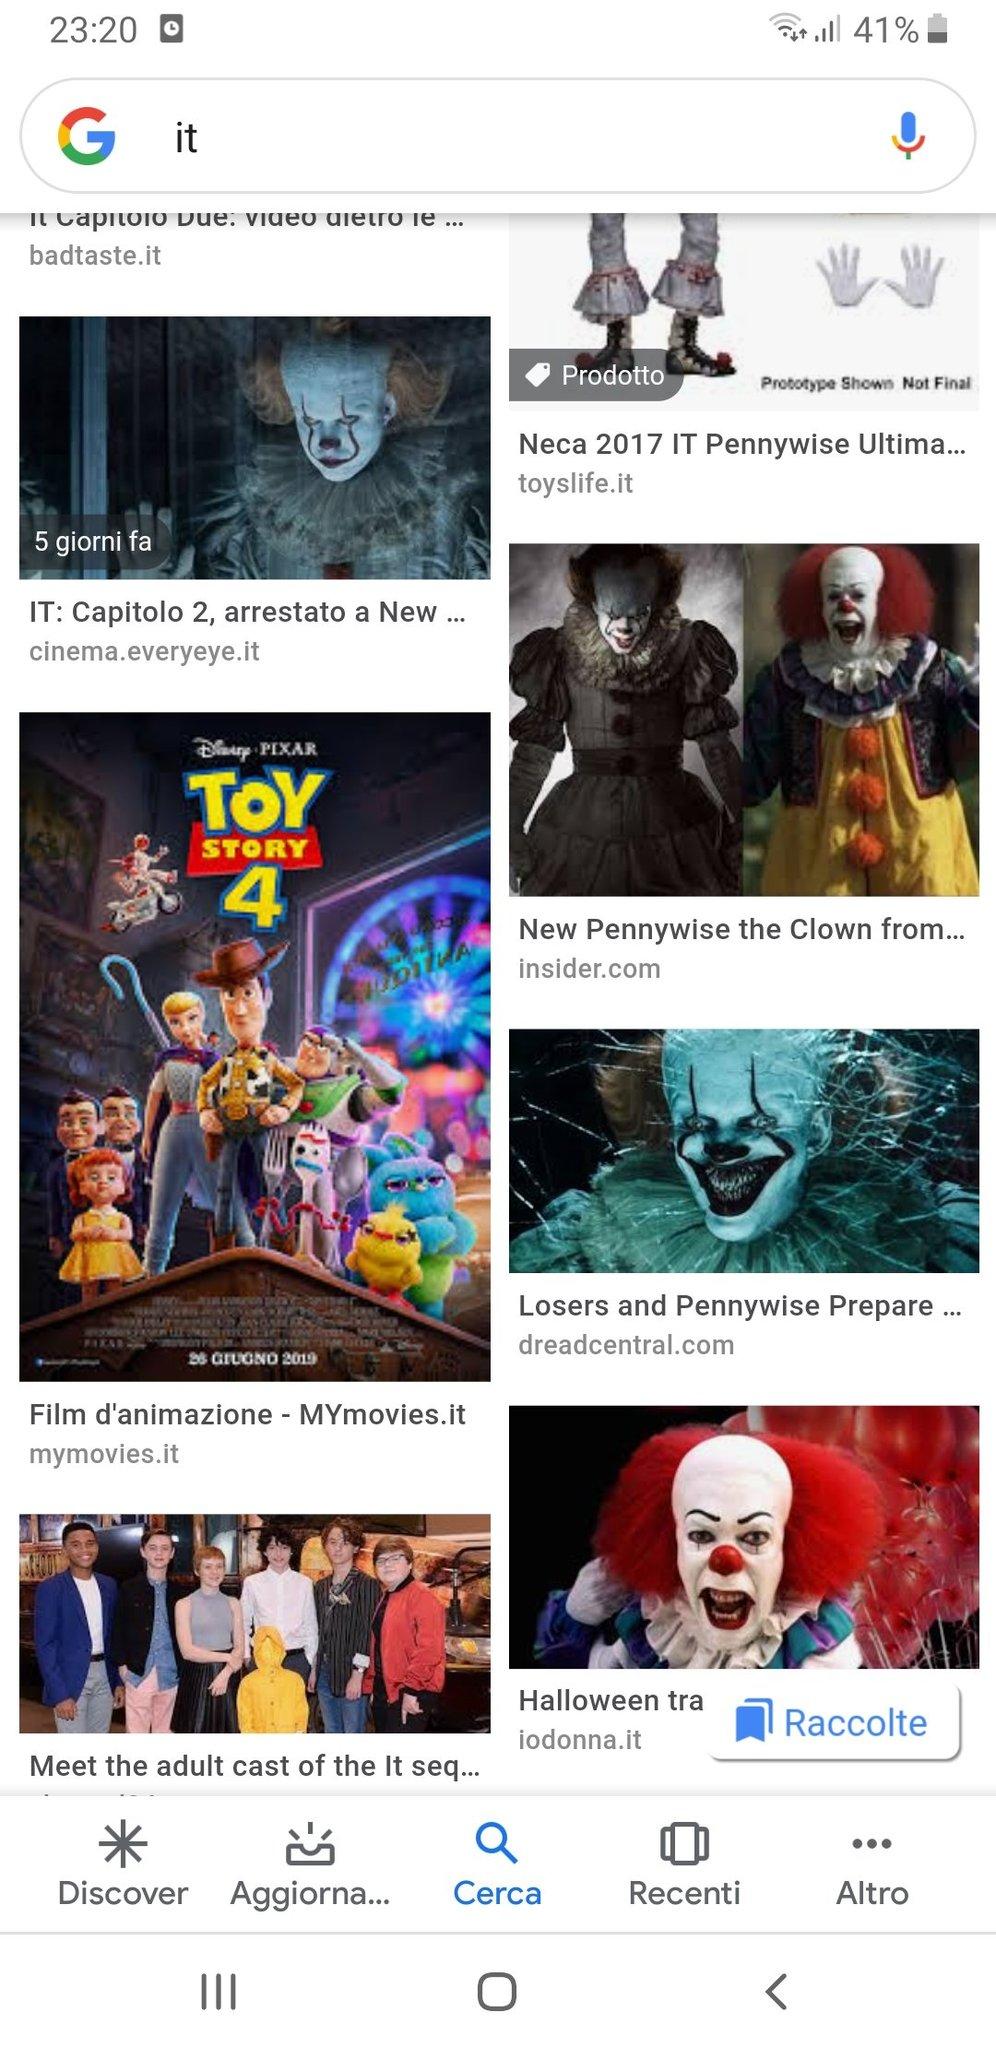 Cercando it si trova toy story 4 - meme